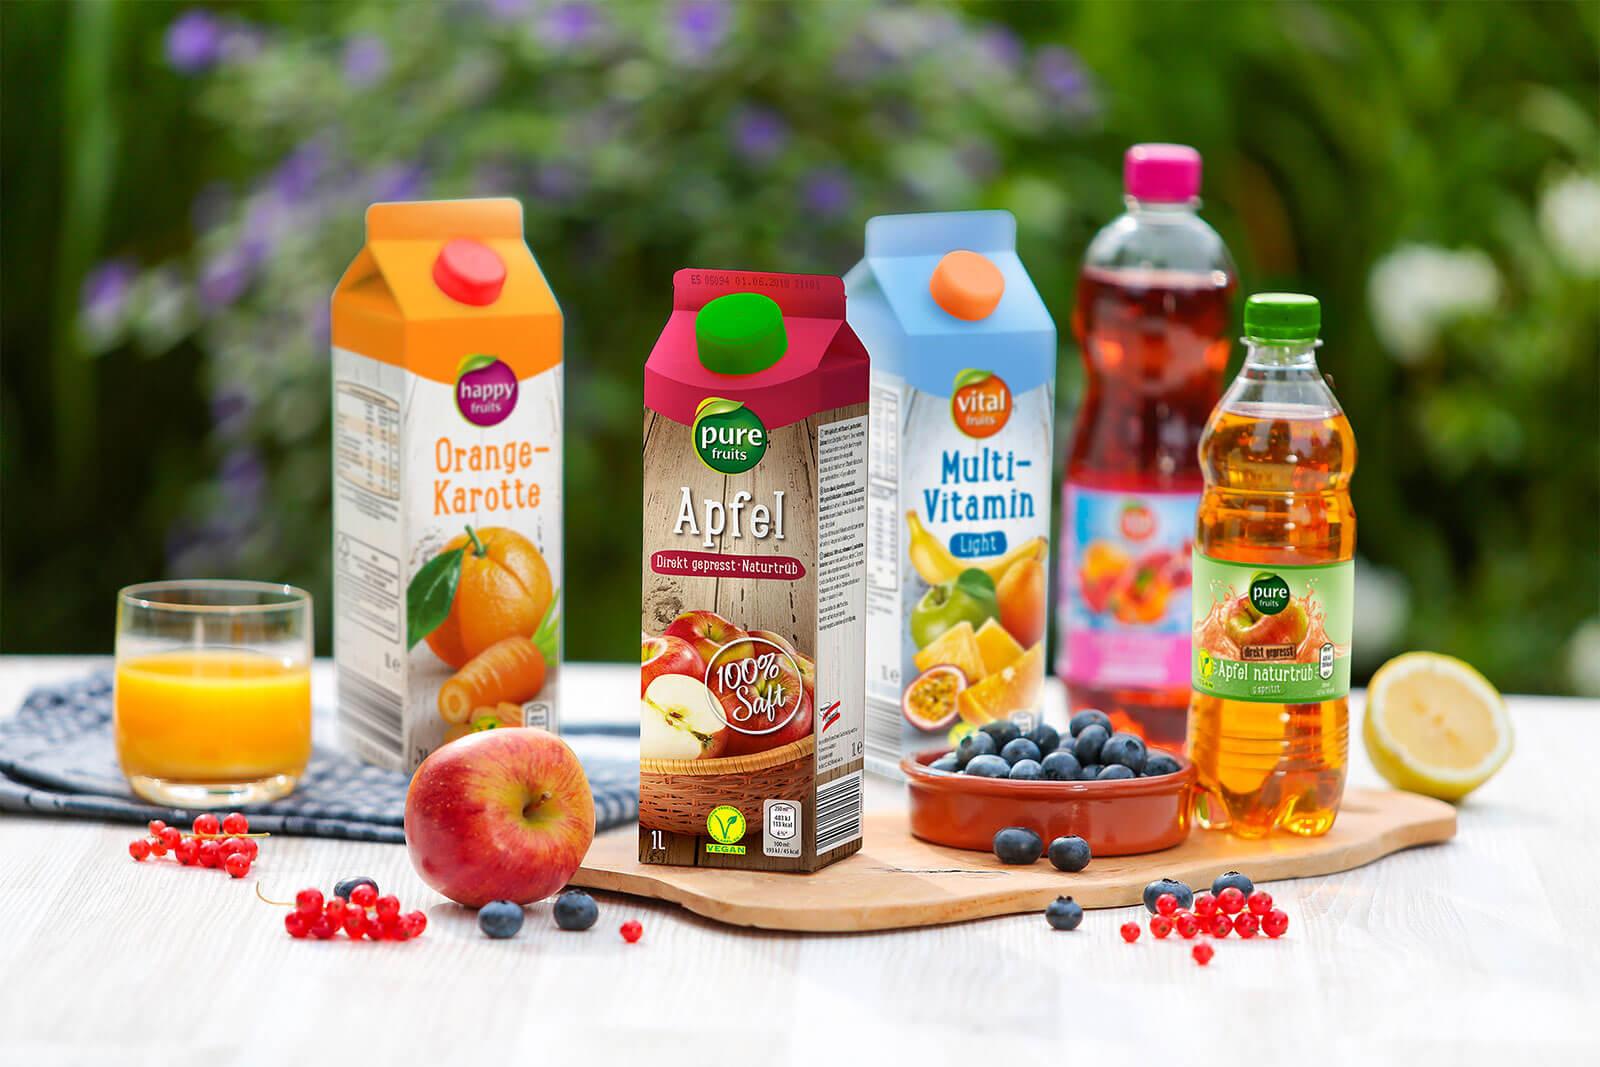 hofer saefte fair fruits imagebild 3 sorten multivitamin orange orange mango schorlen design packaging rubicon